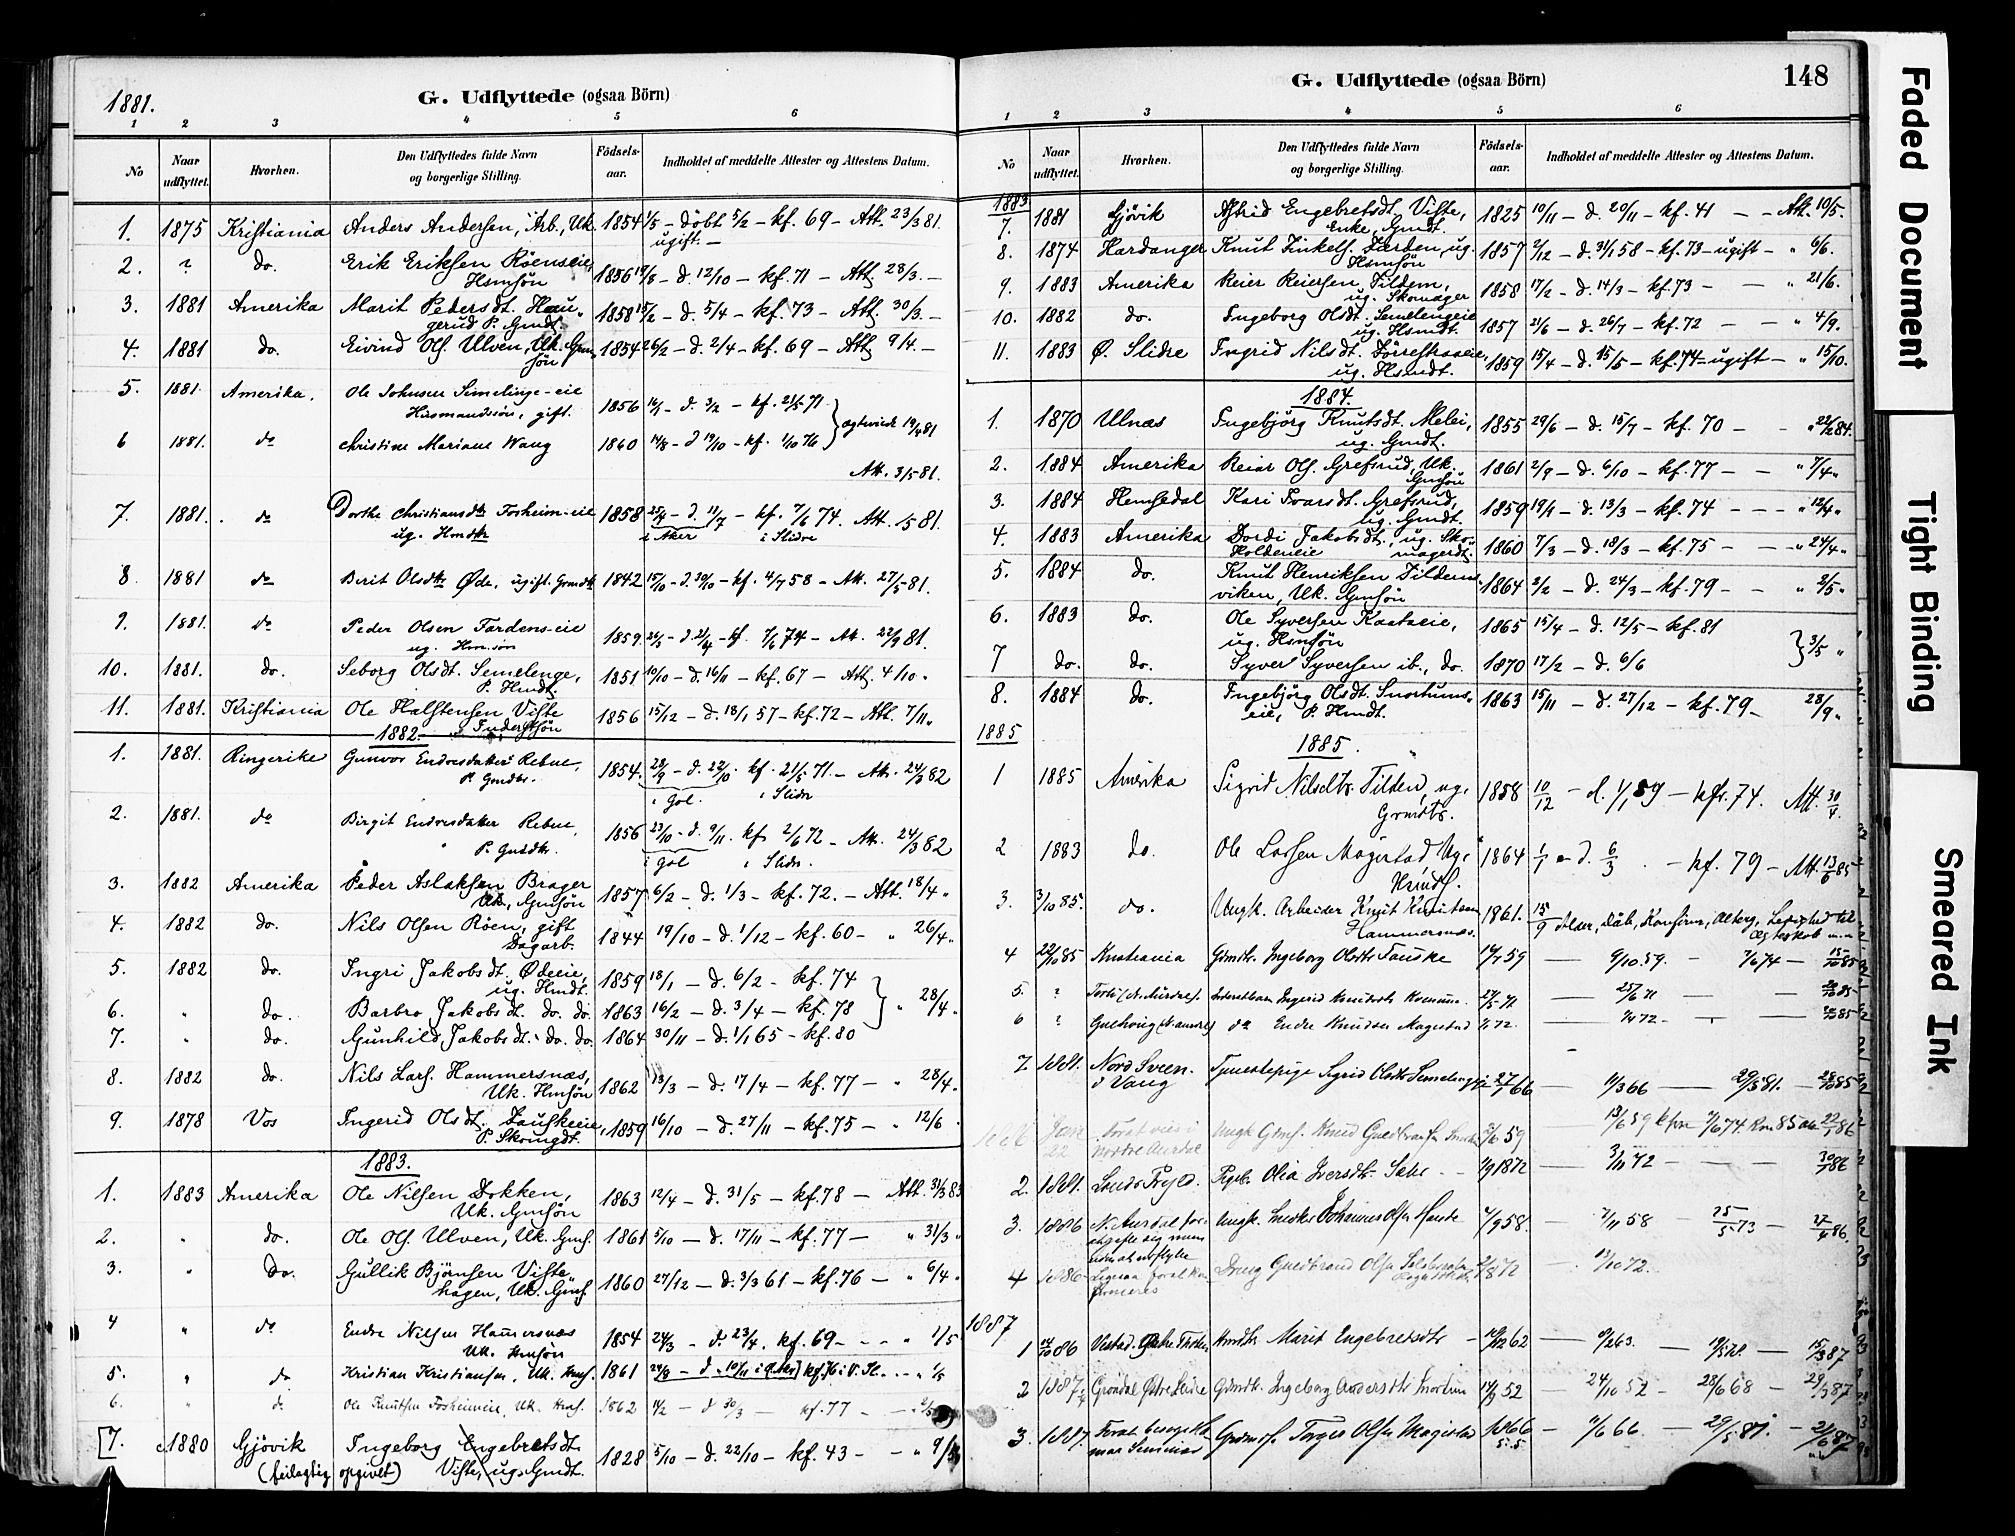 SAH, Vestre Slidre prestekontor, Ministerialbok nr. 6, 1881-1912, s. 148